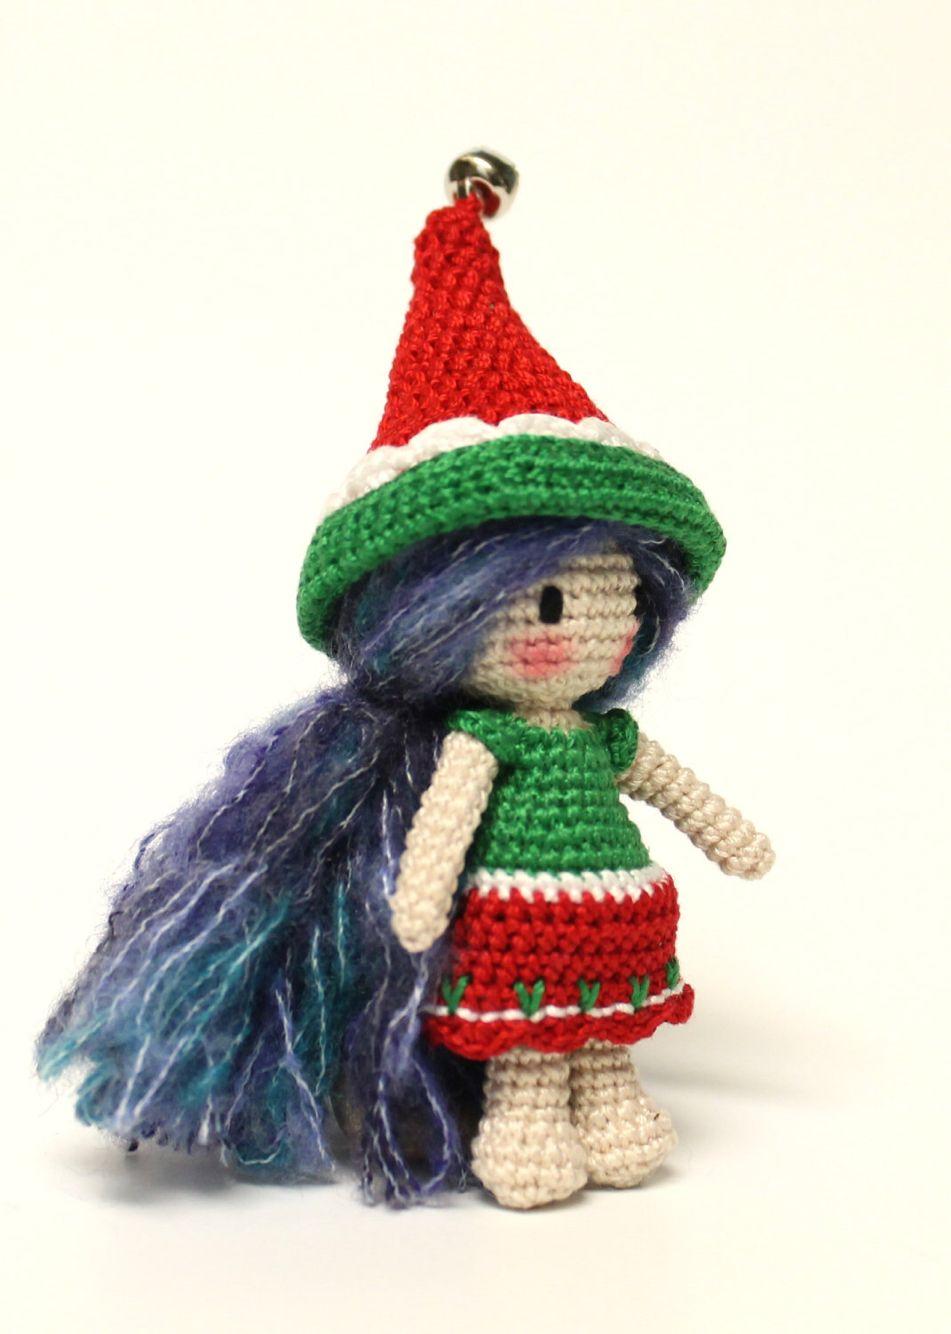 ☆ amigurumi #amigurumidoll #crochet #crochetdoll #crochetgarland #yarn #knitting #crochetting #craft #amigurumicrochet #amigurumipattern #crochetmini #crochetpattern #crochetjapan